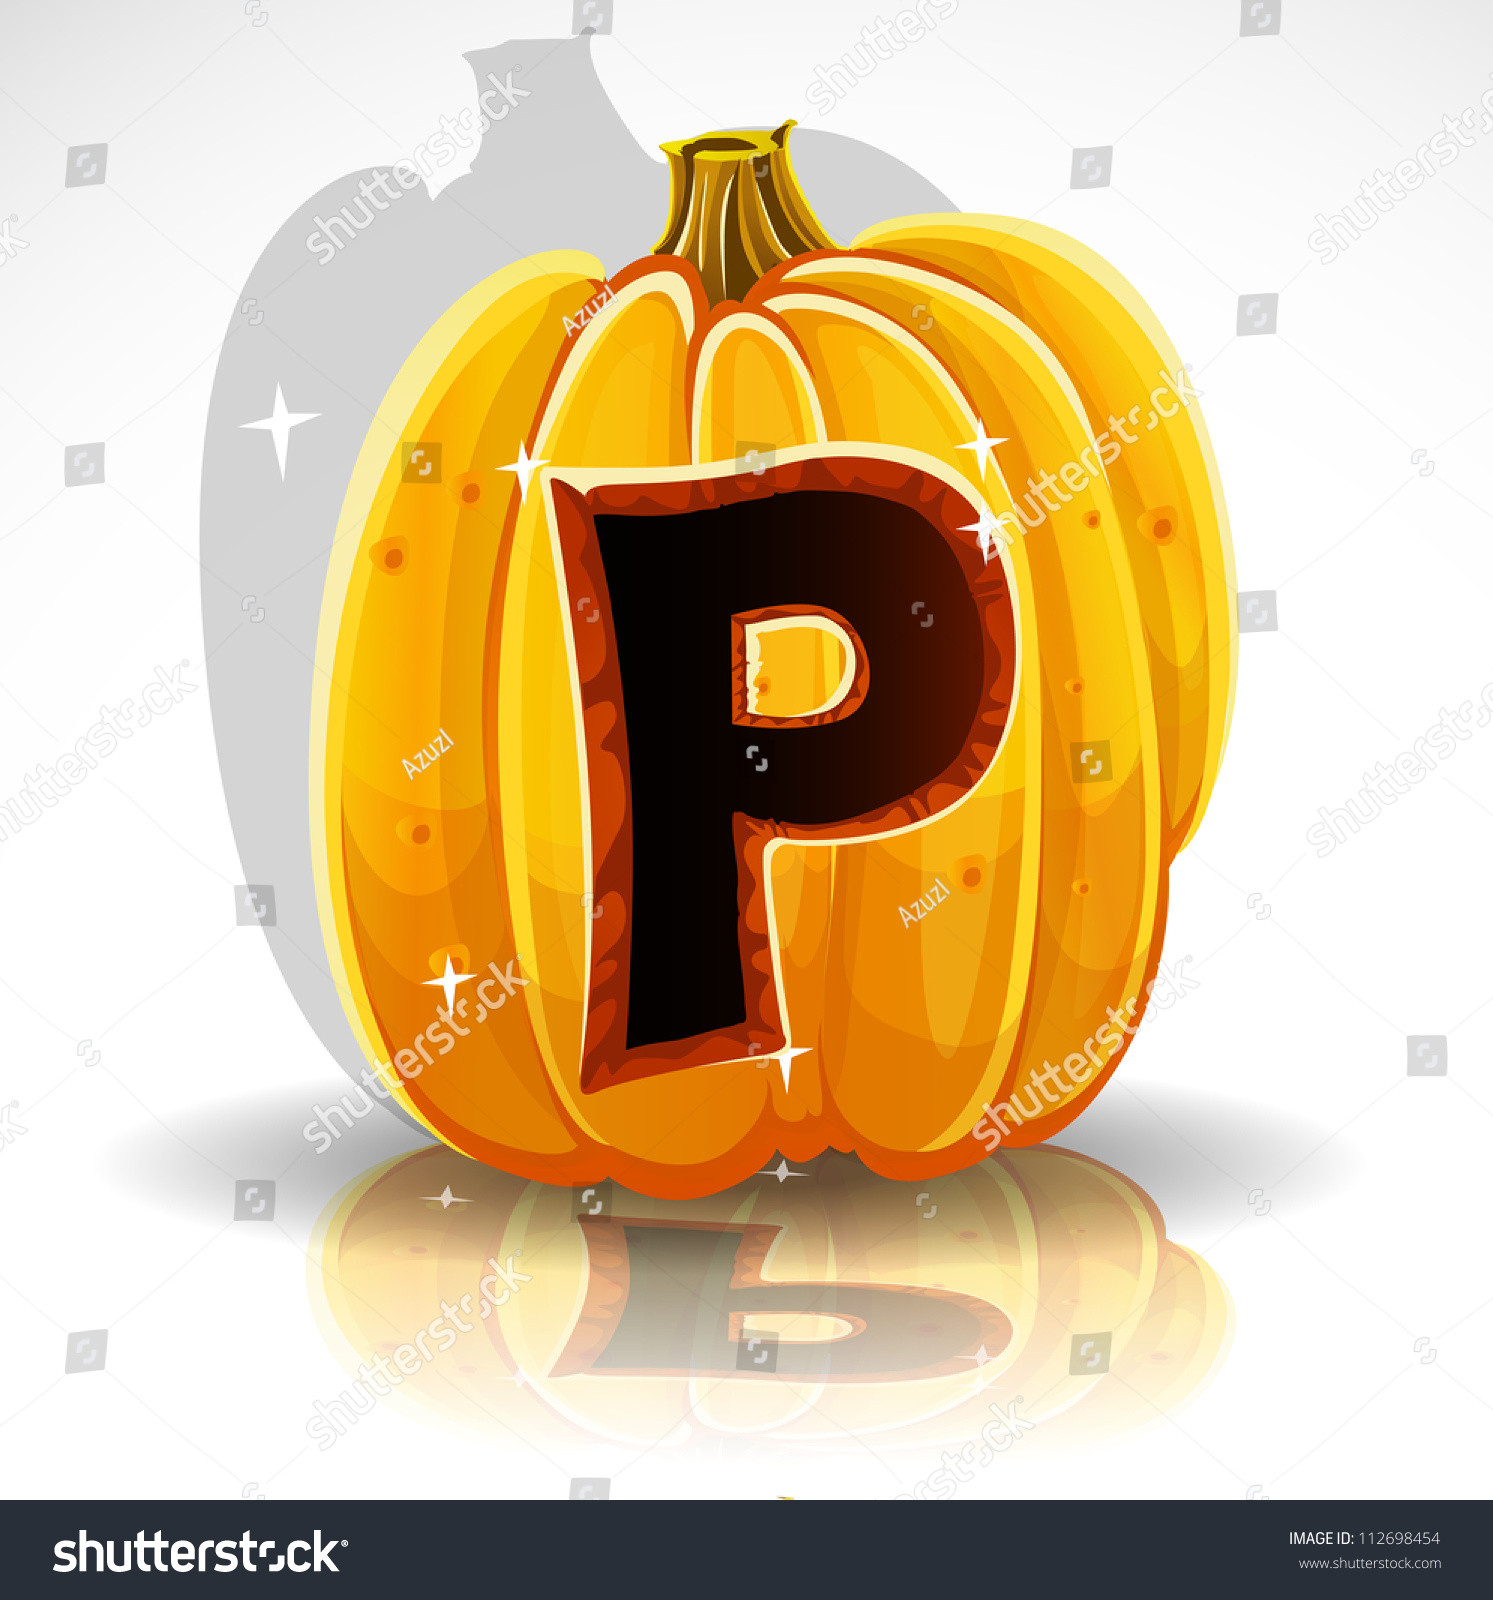 Happy Halloween Font Cut Out Pumpkin Letter P Stock Vector